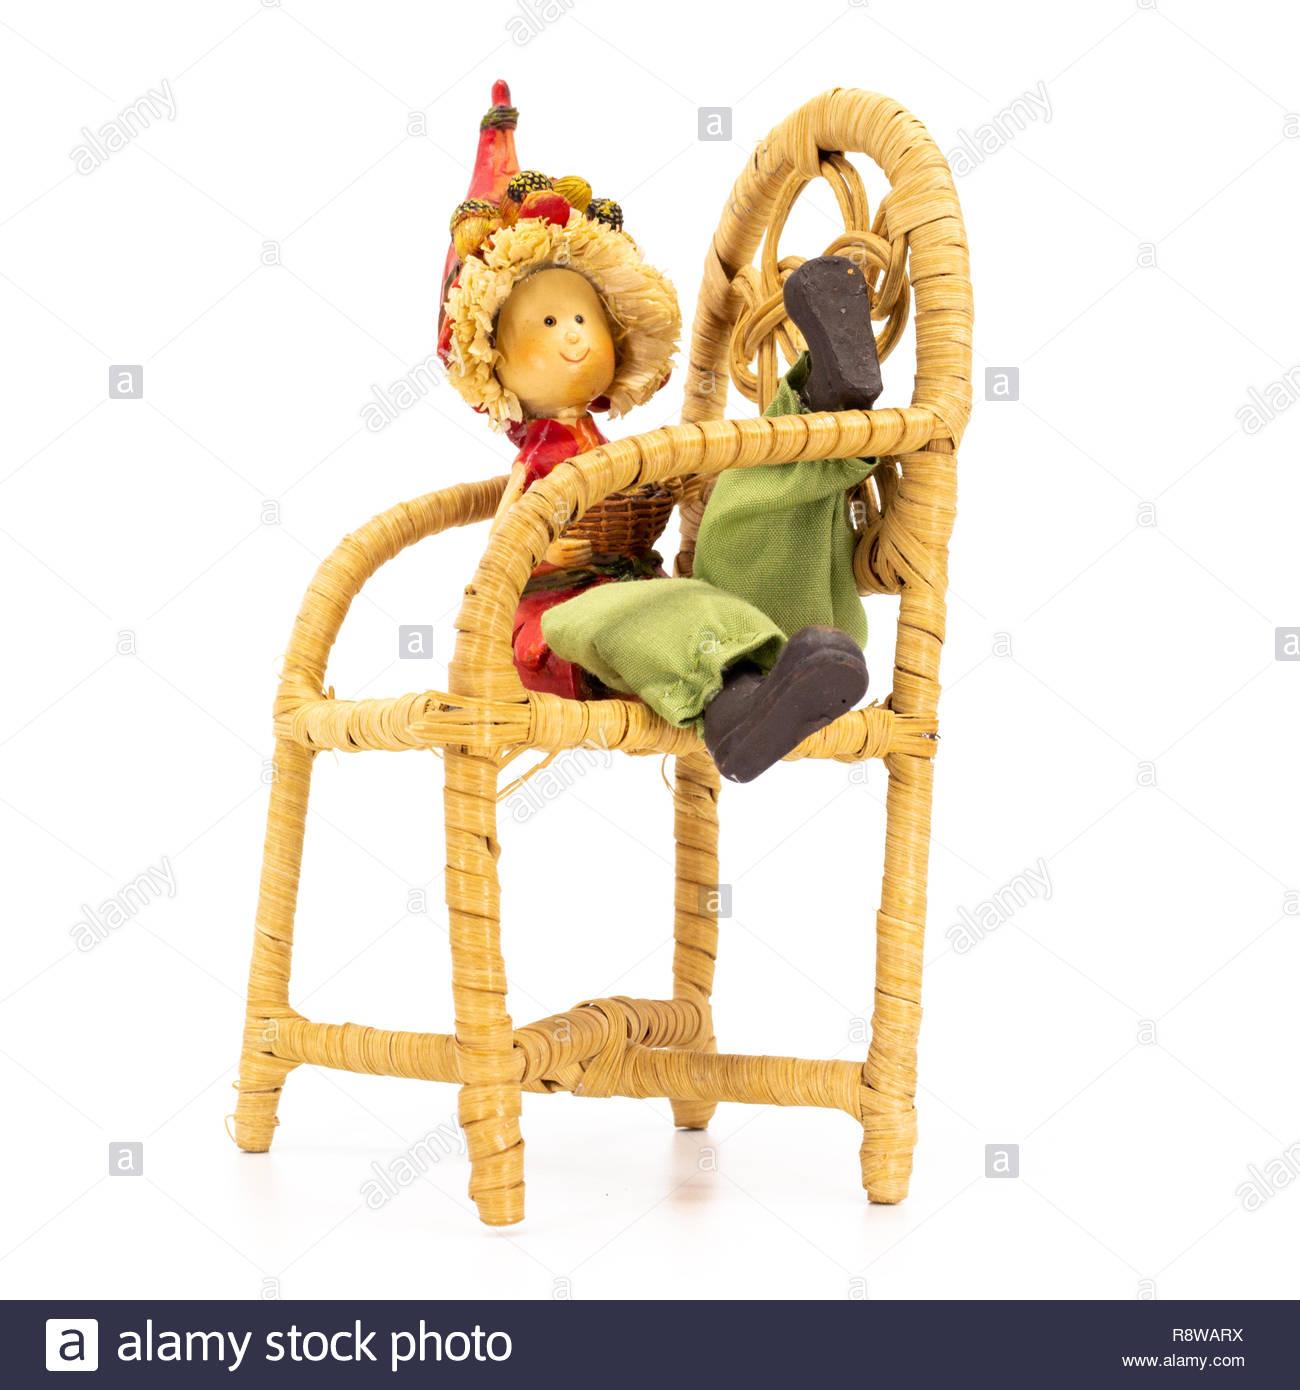 Sitting In Basket Chair Stock Photos Amp Sitting In Basket